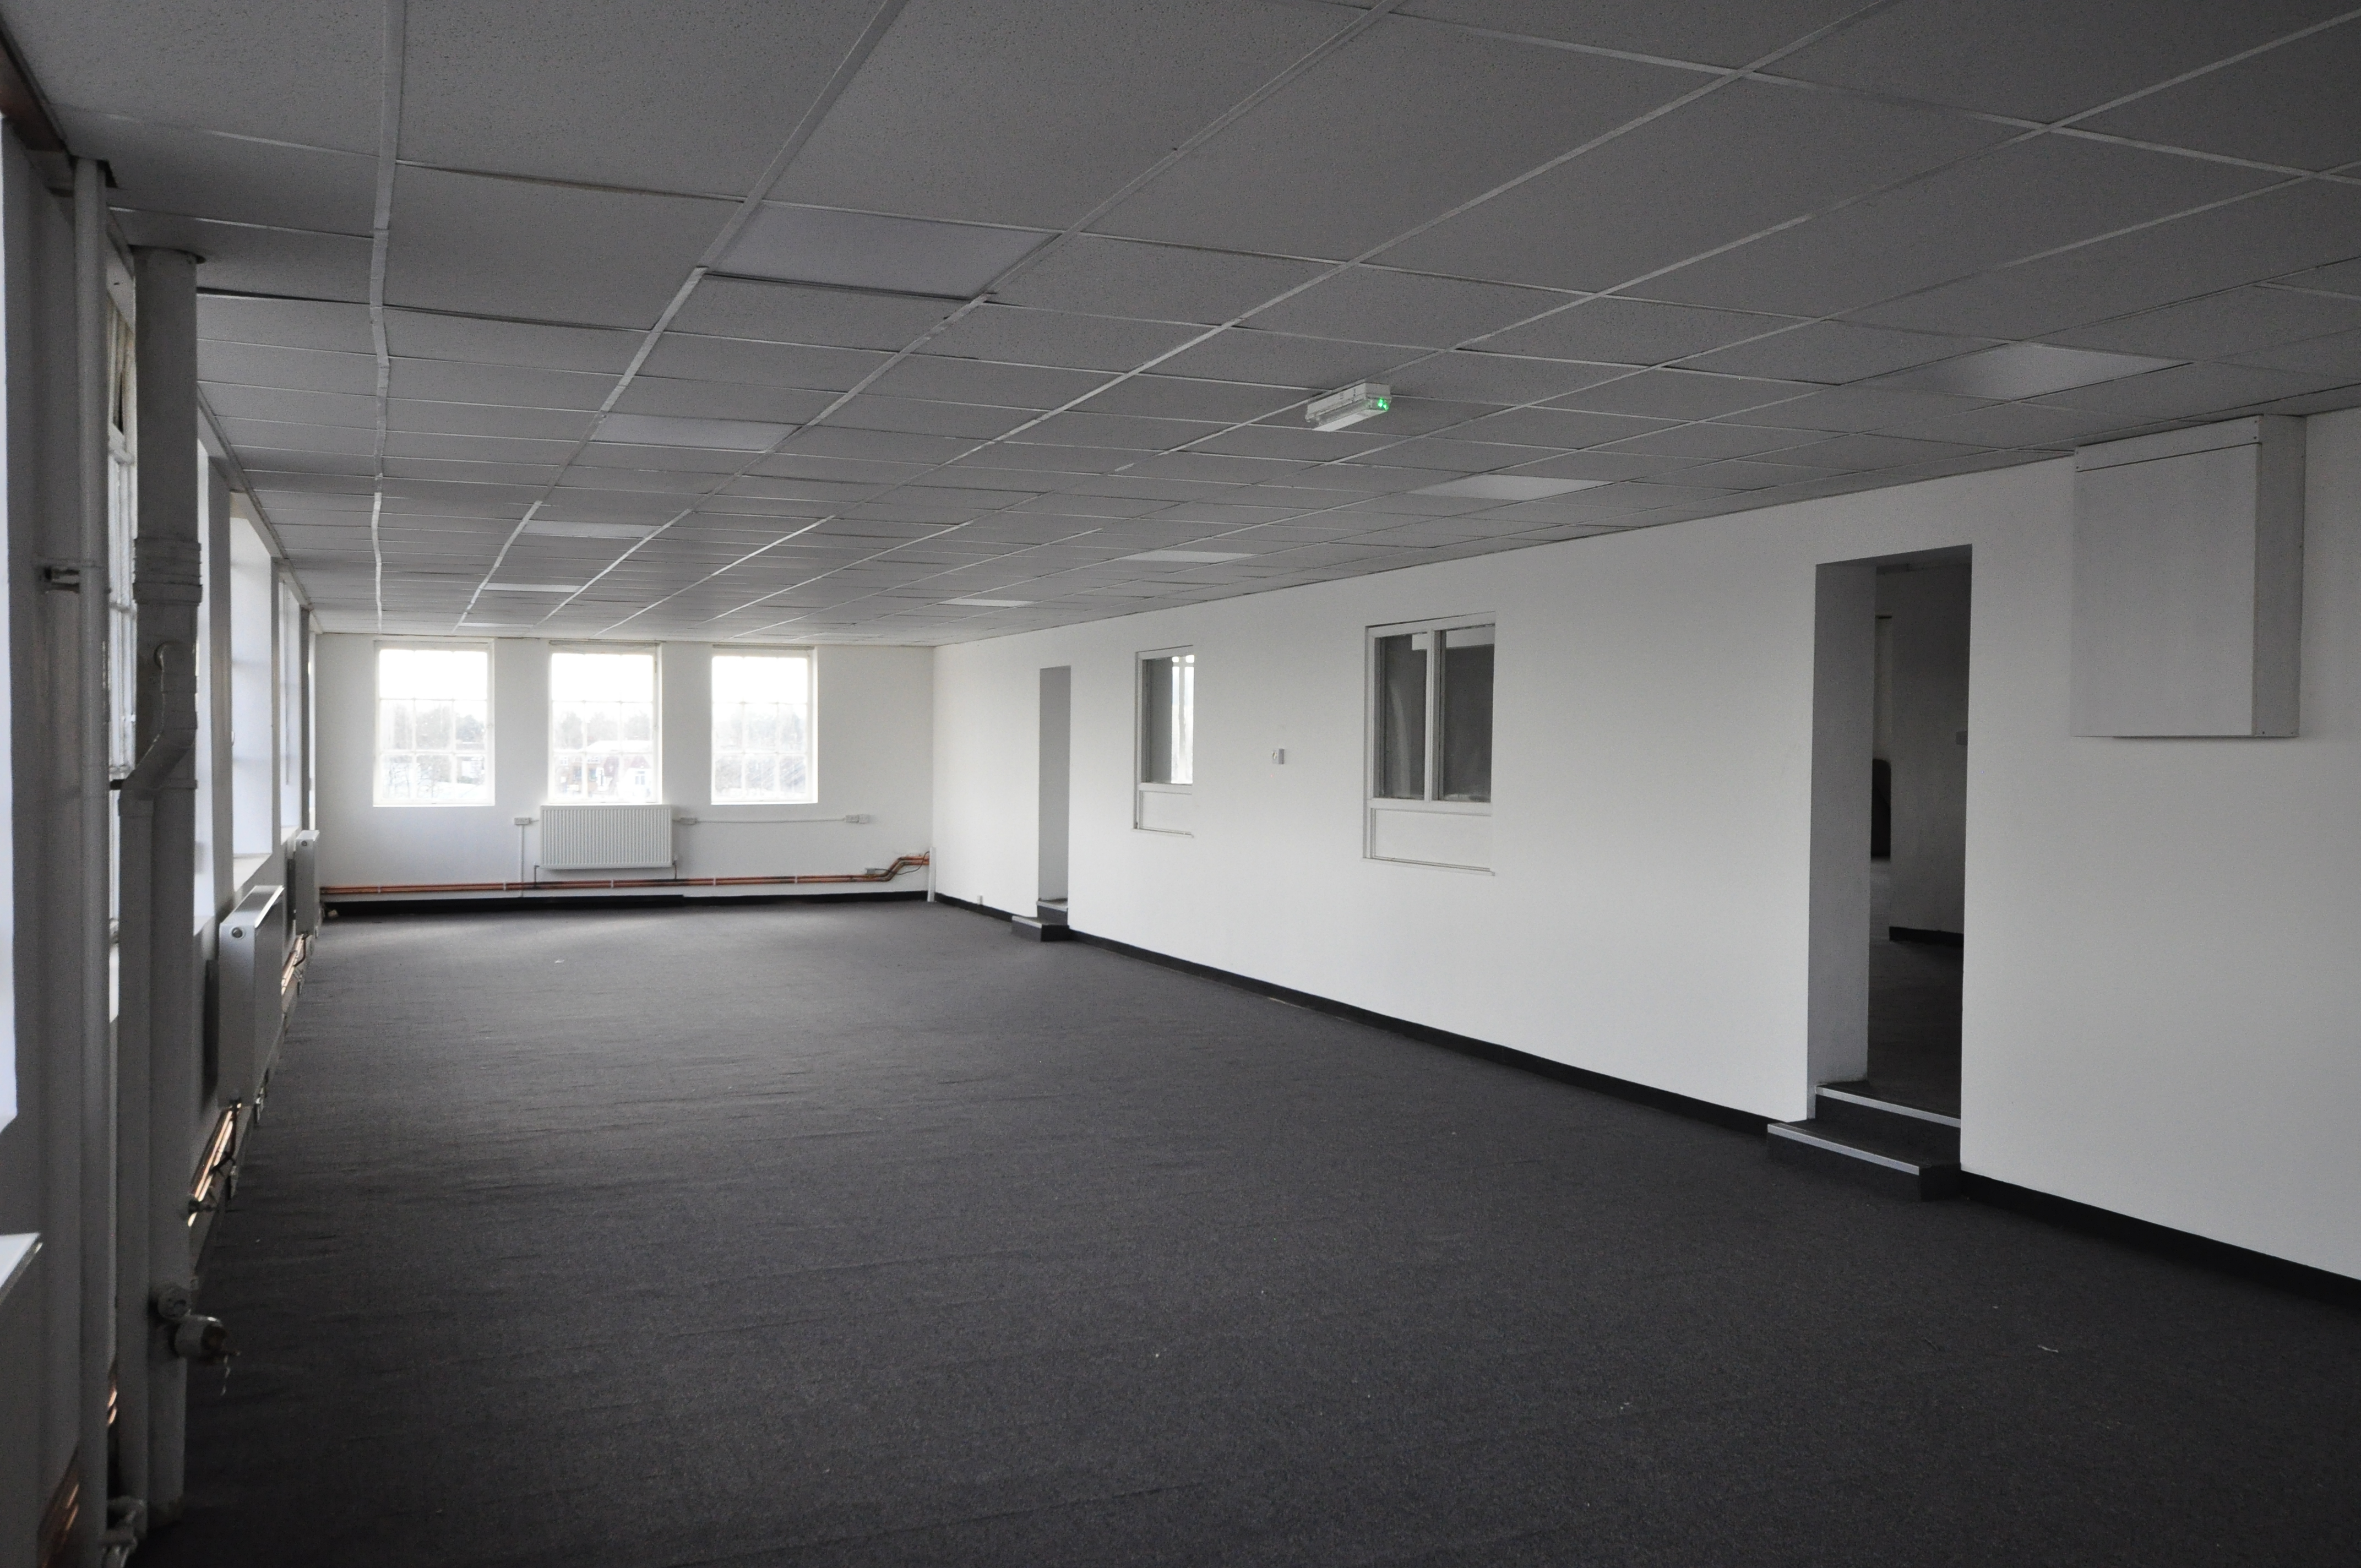 Neasden Warehouse, NW10 2XA - 2nd Floor Offices - Image 11